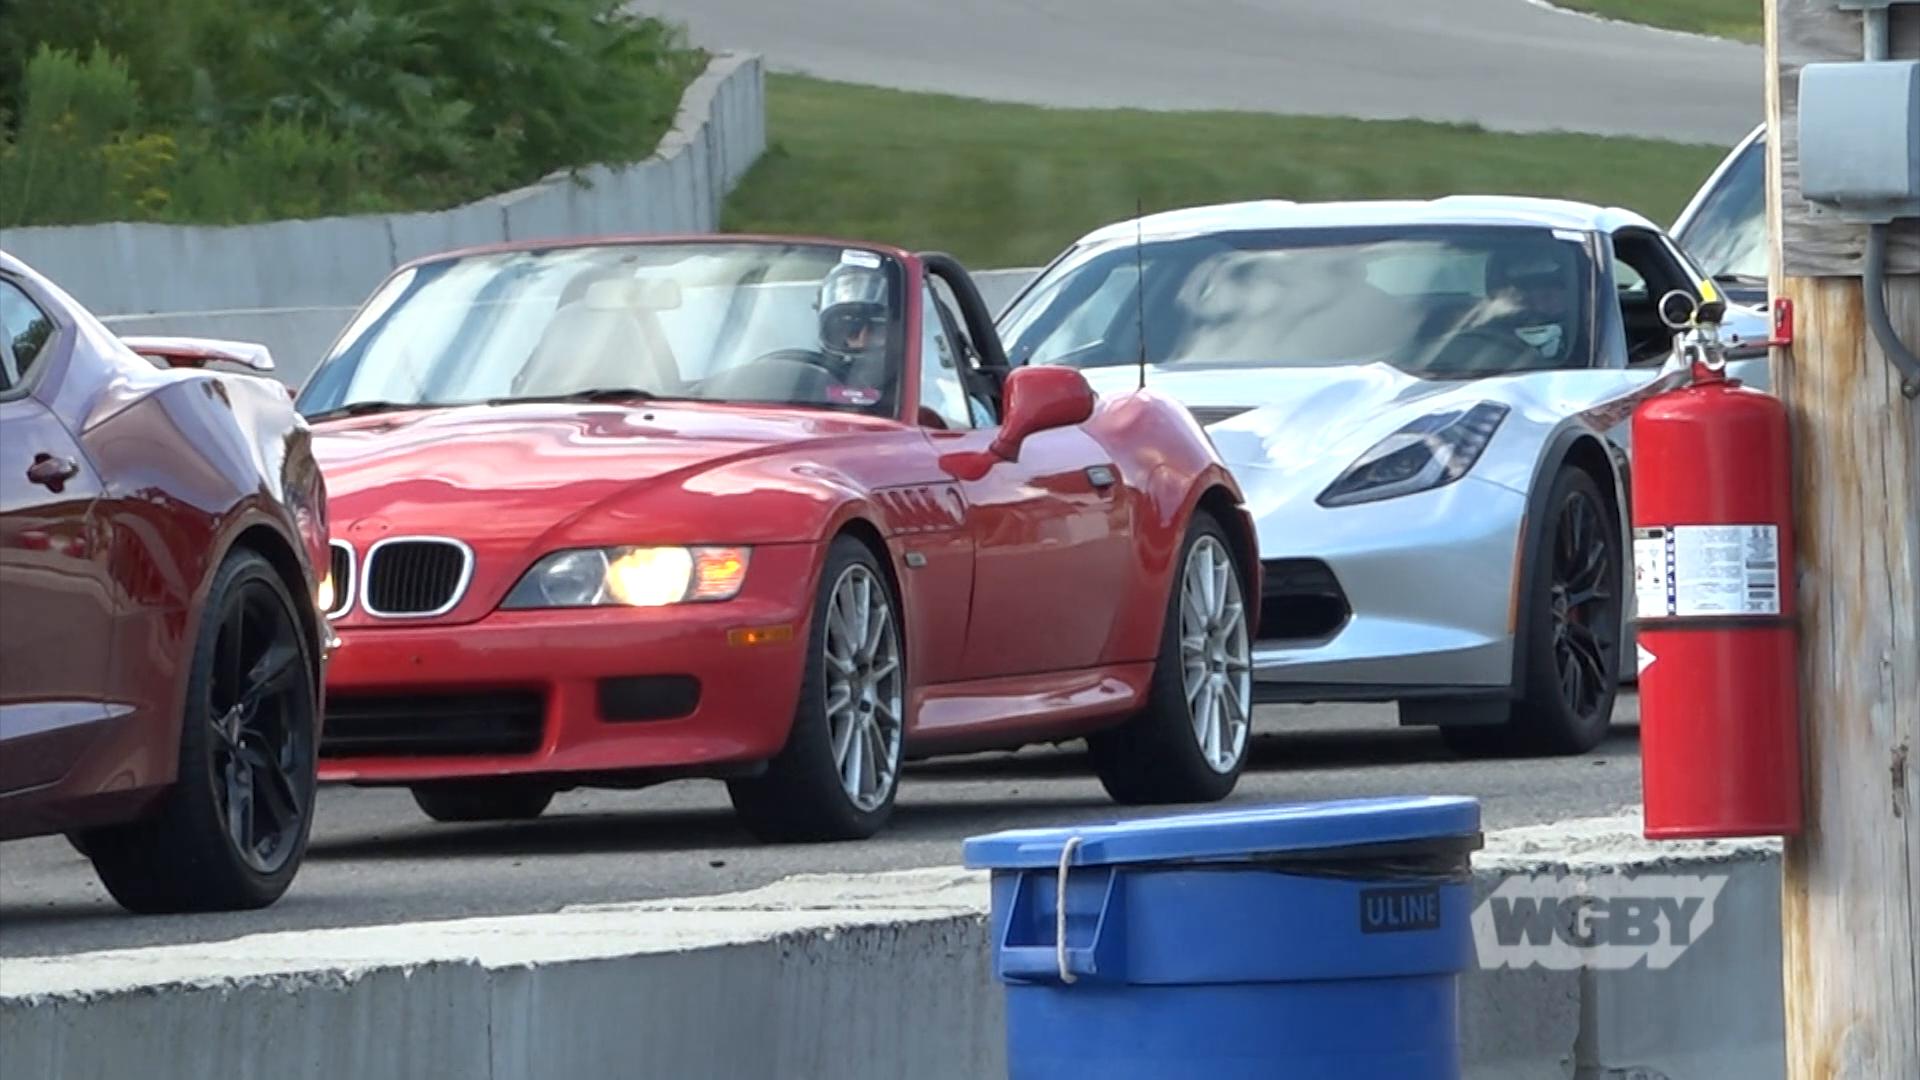 Palmer Motorsports Park Brings Racing to Western Mass